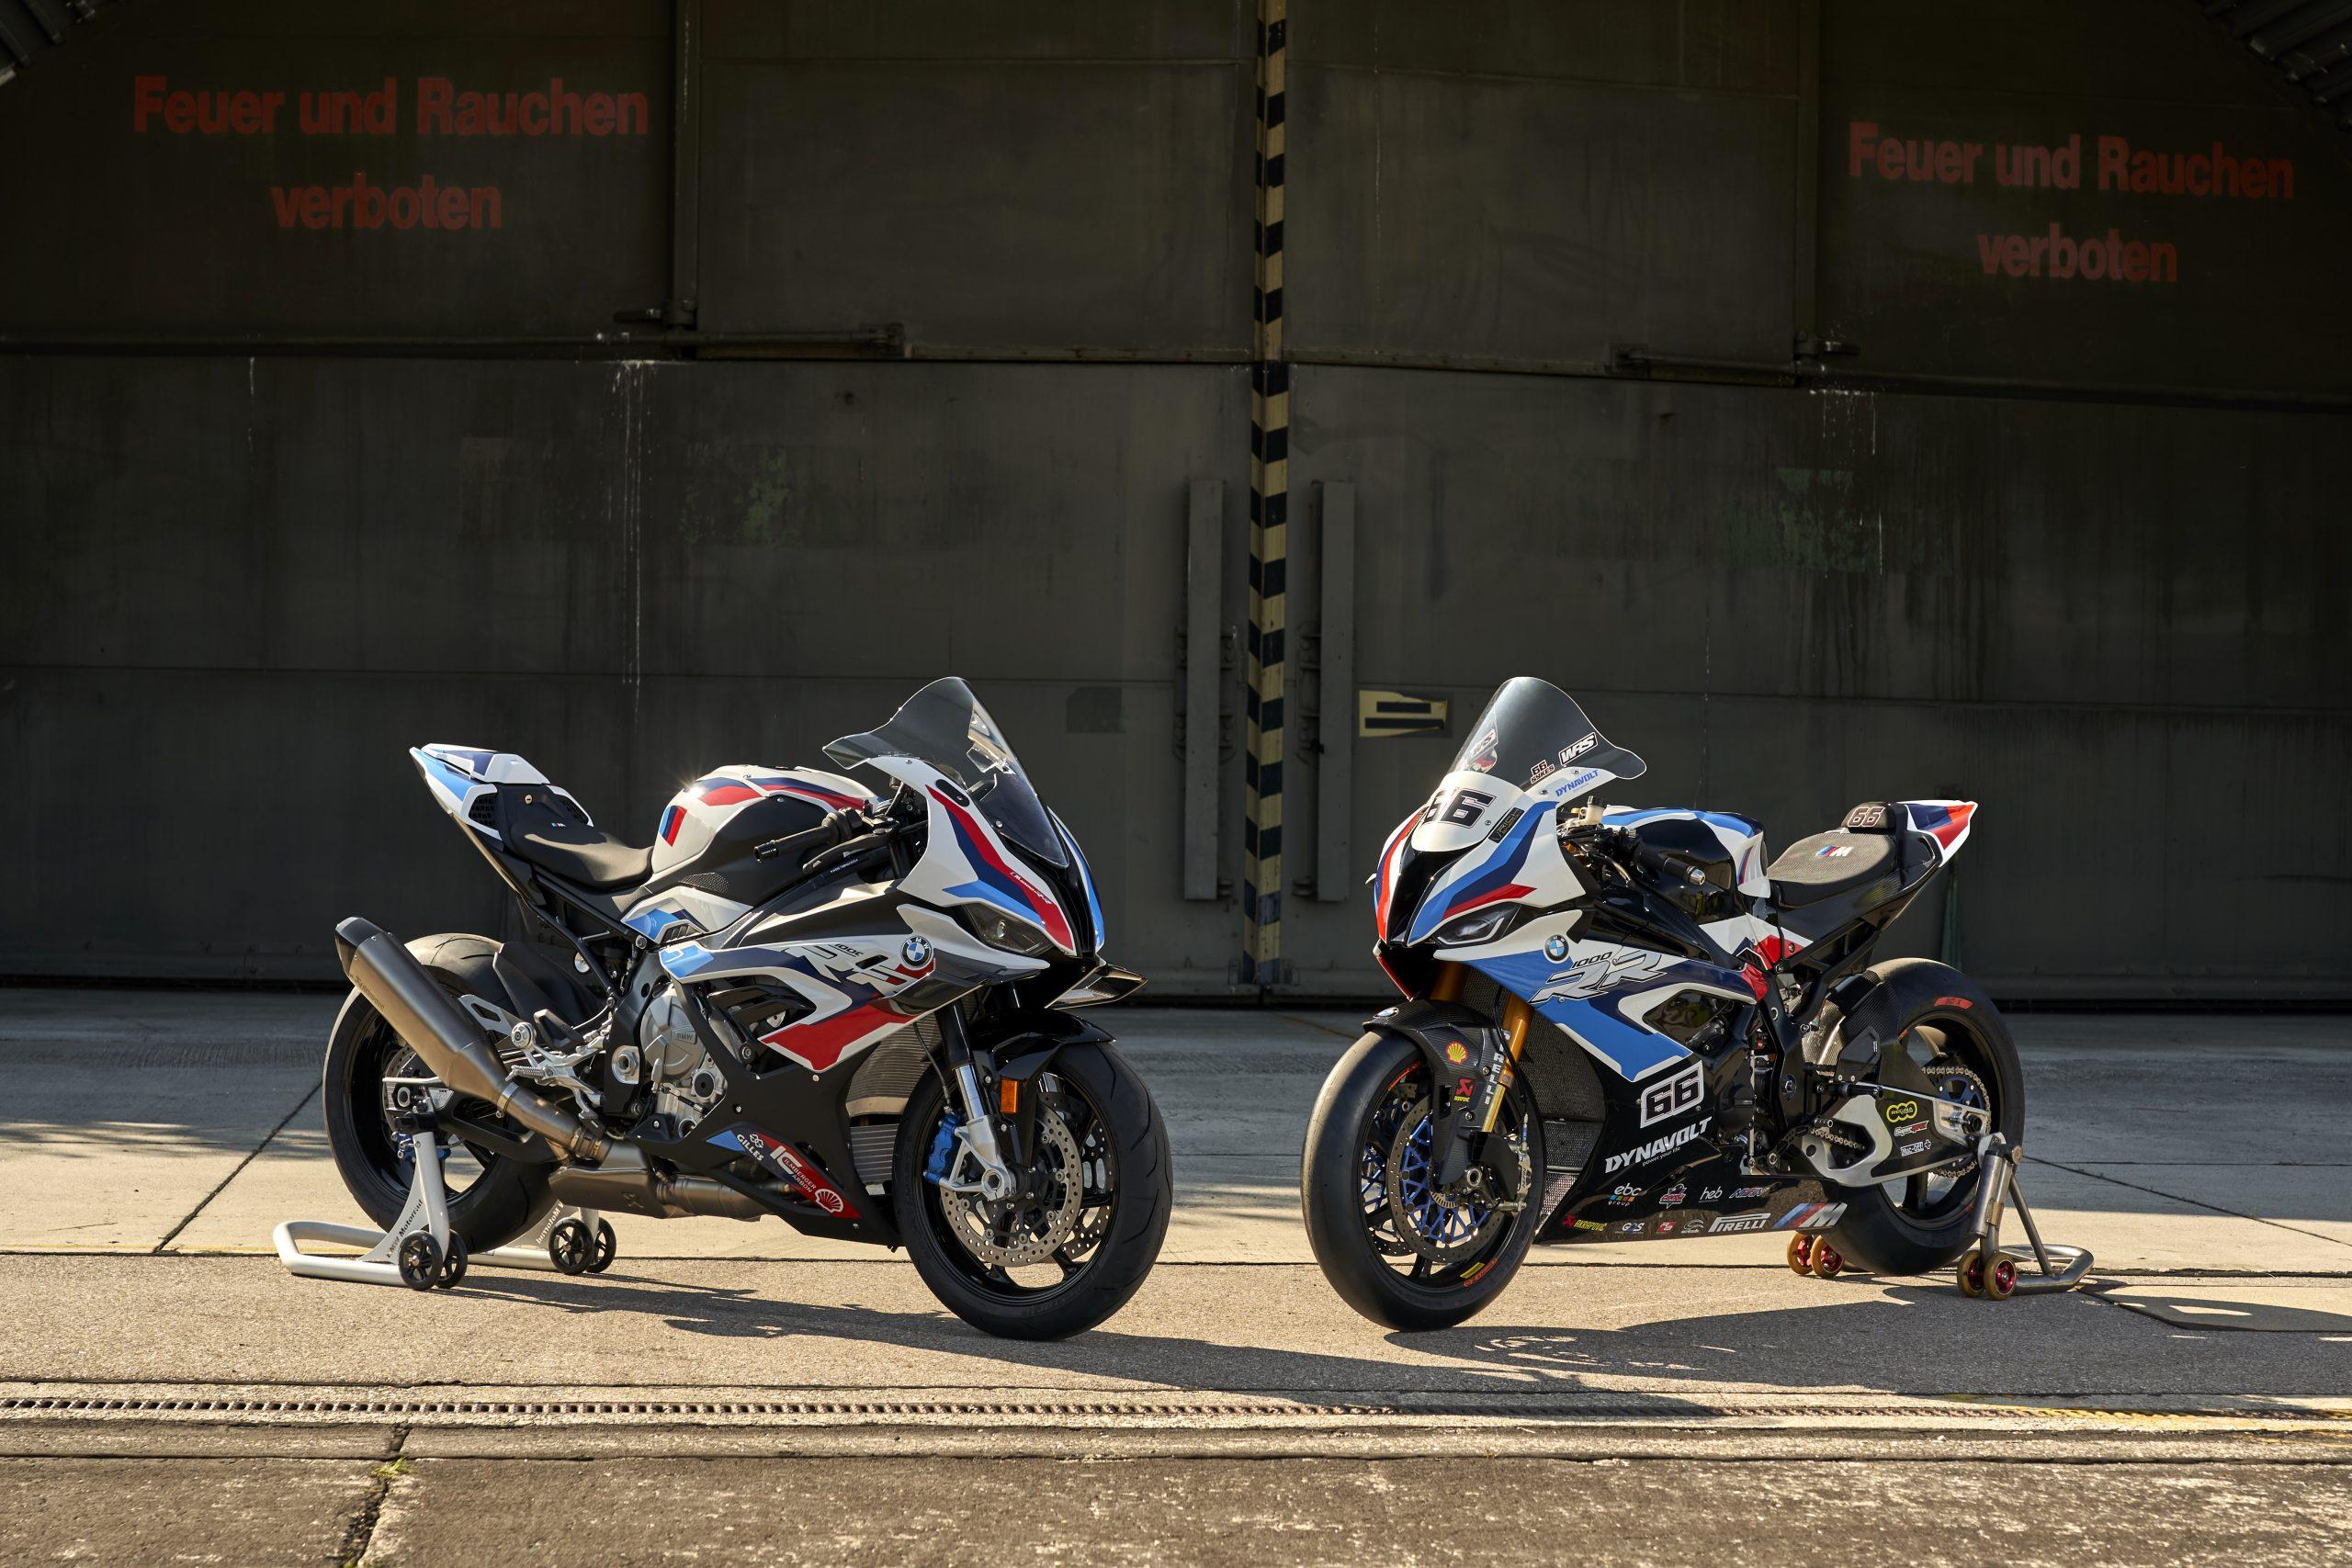 Introducing The All New Bmw M 1000 Rr Bmw Motorrad Wsbk